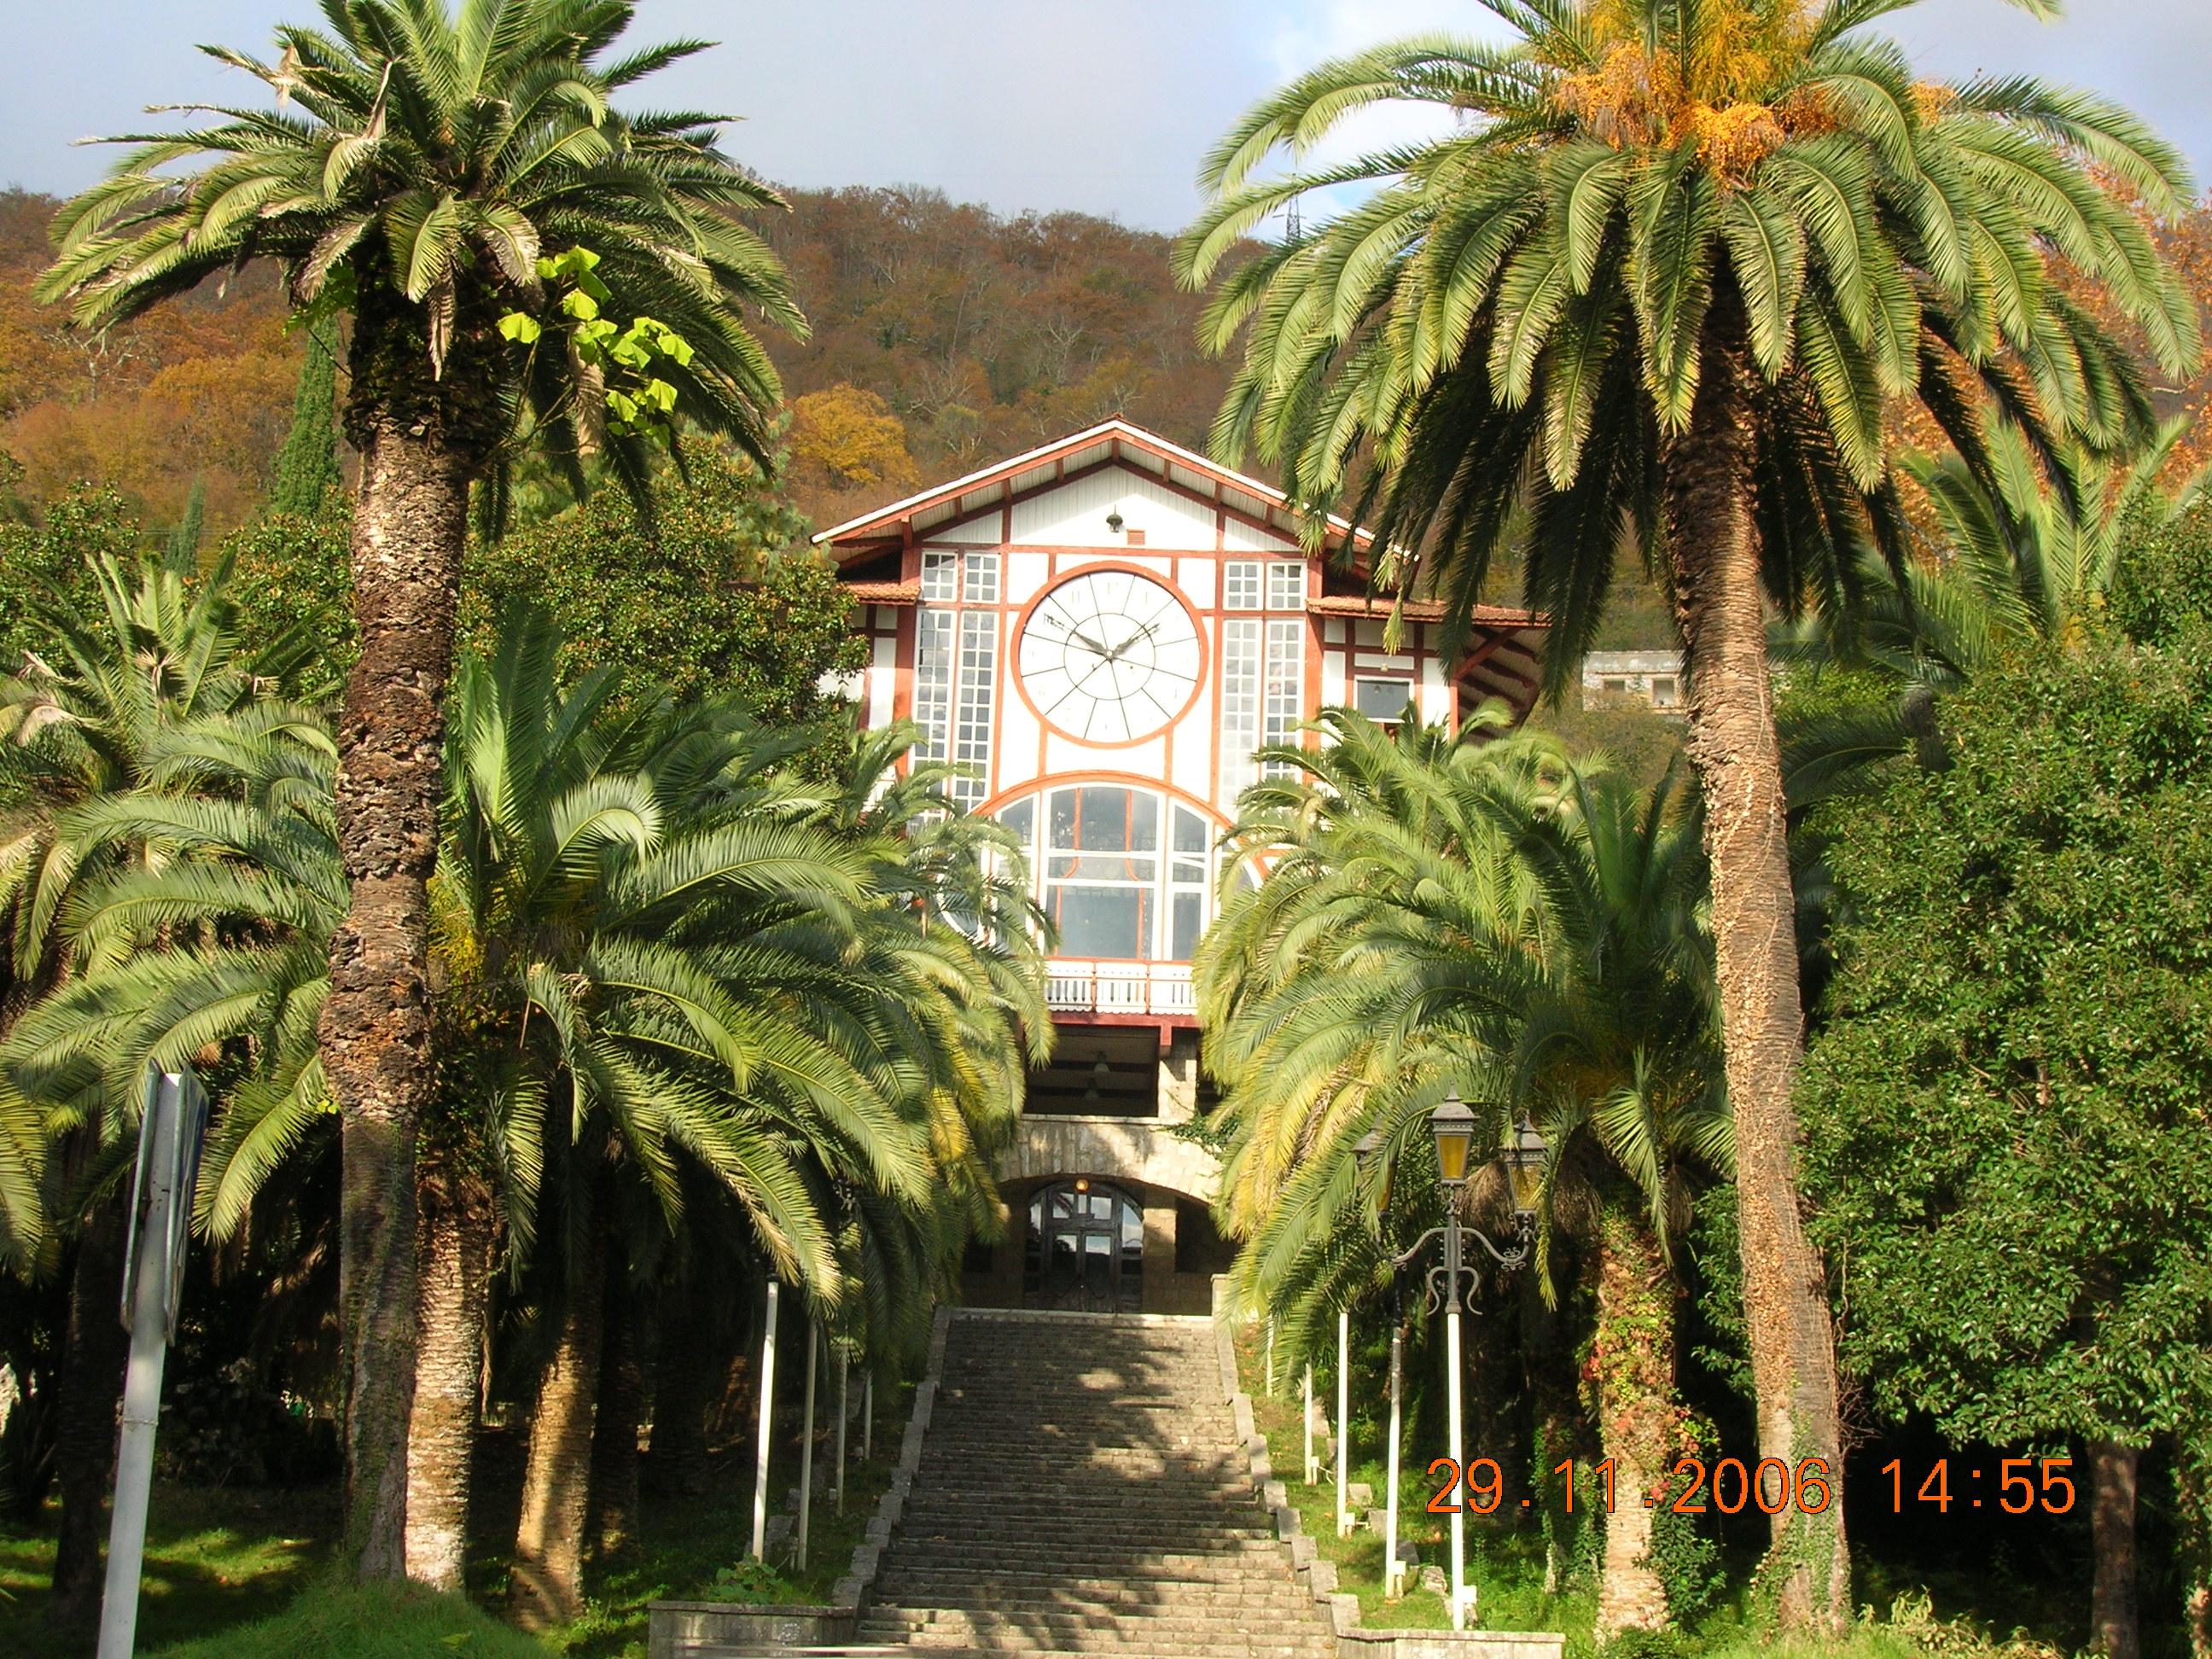 Where are Gagra Abkhazia, the city of Gagra 61